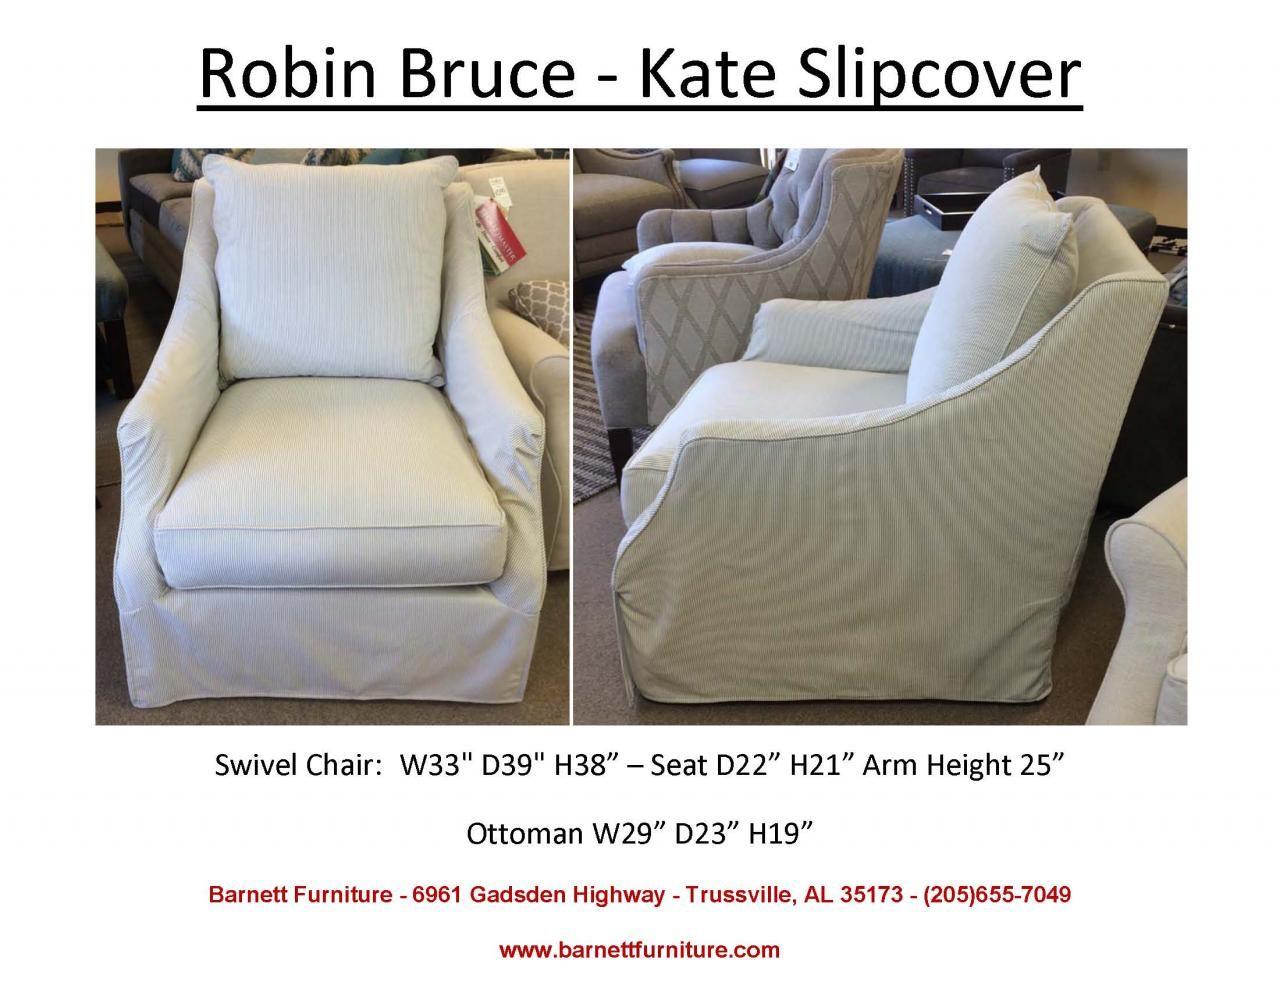 Robin Bruce Kate Slipcover Swivel Chair (View 14 of 25)